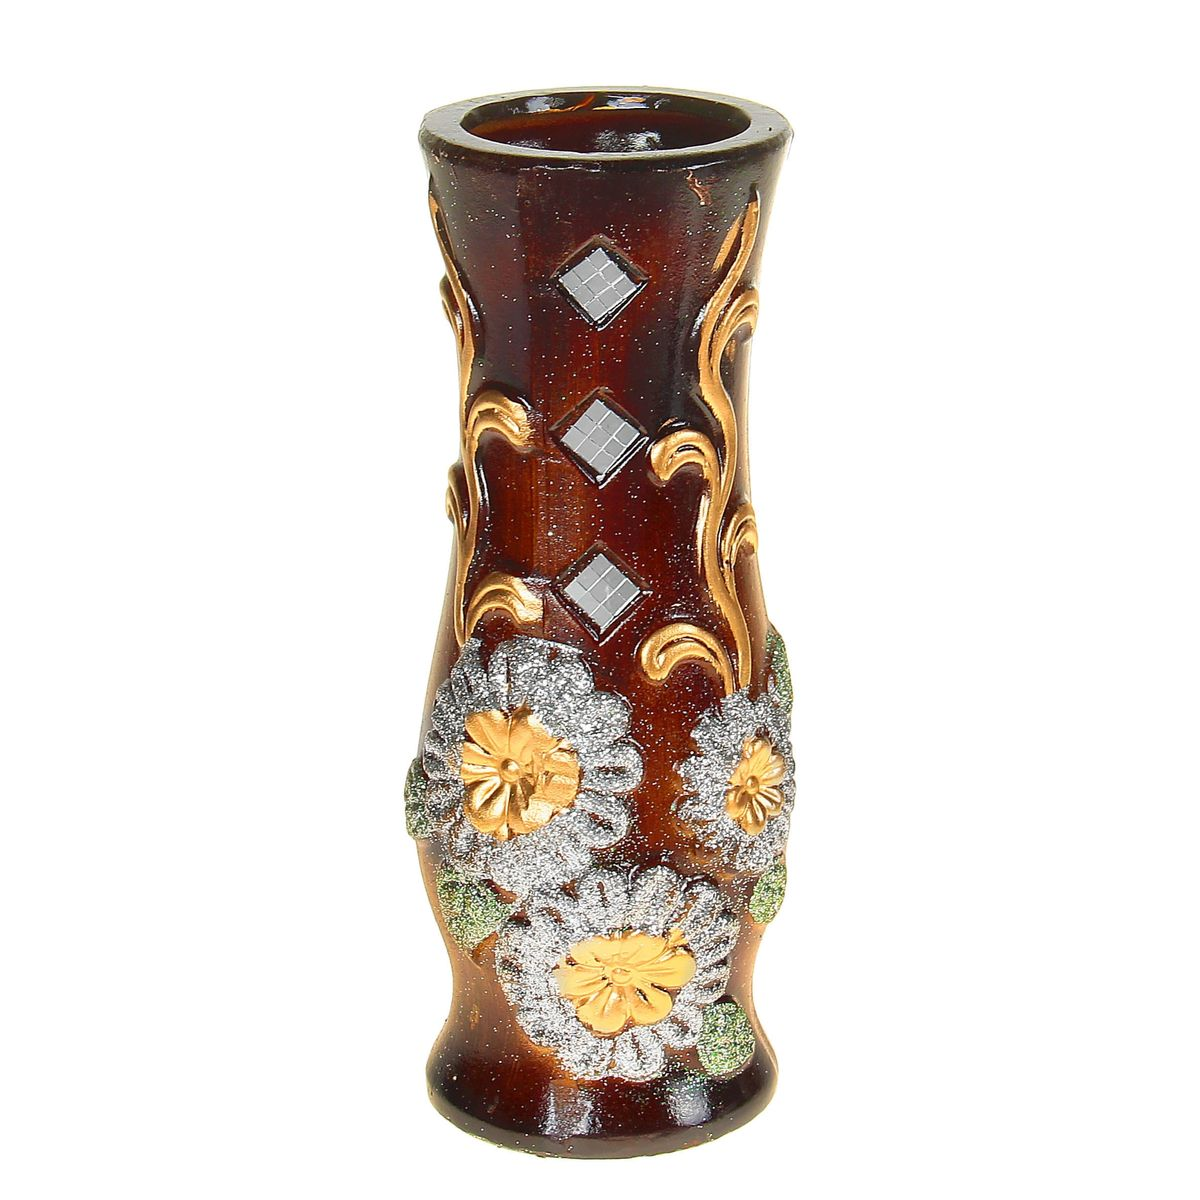 Ваза керамика 30 см цветочки ромбы (3 вида) 10449791044979Керамика